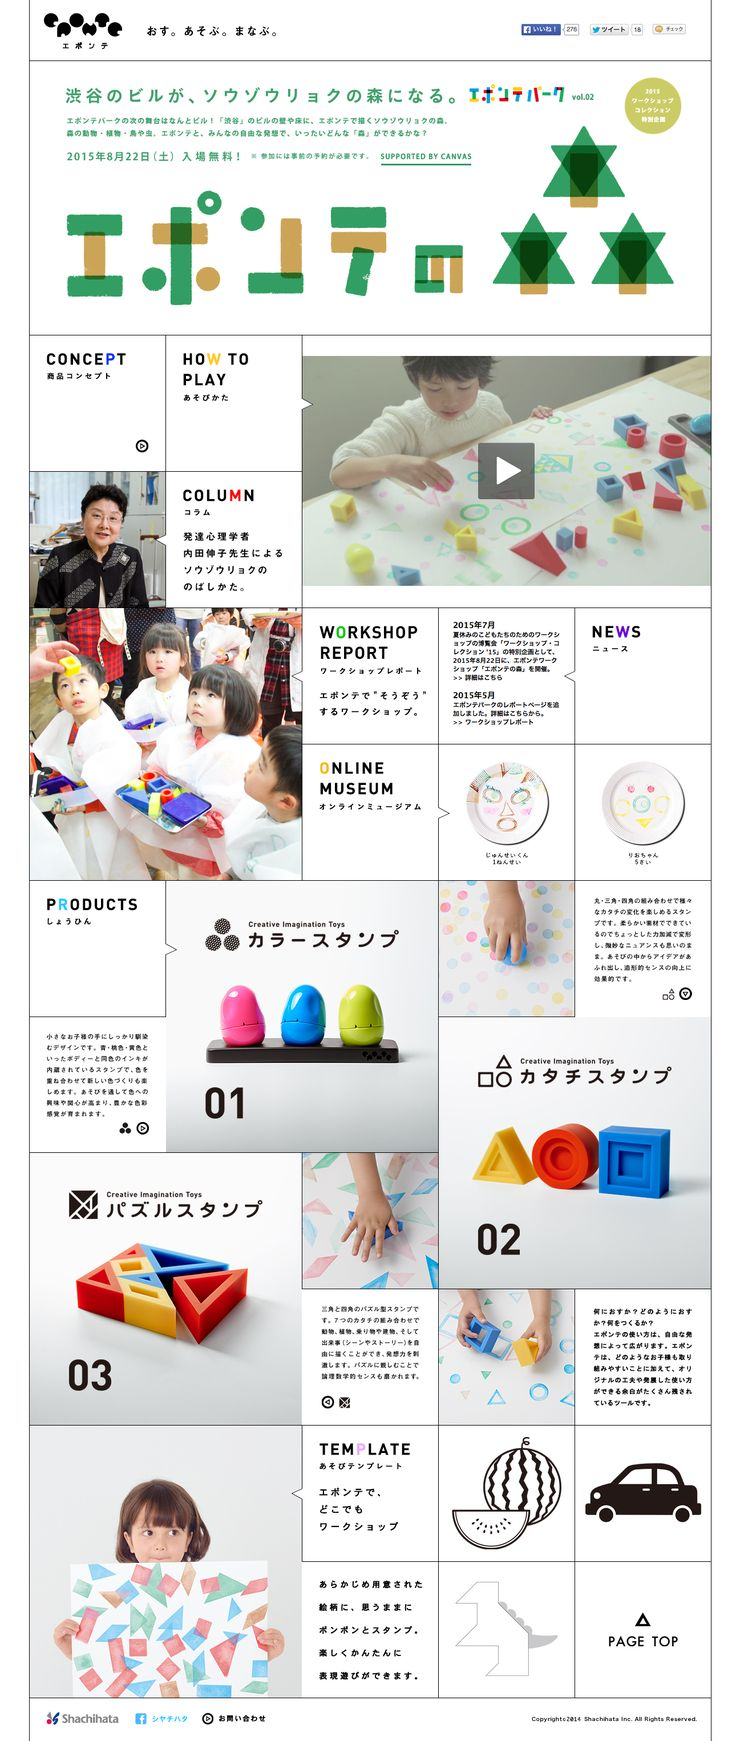 http://www.shachihata.co.jp/eponte/